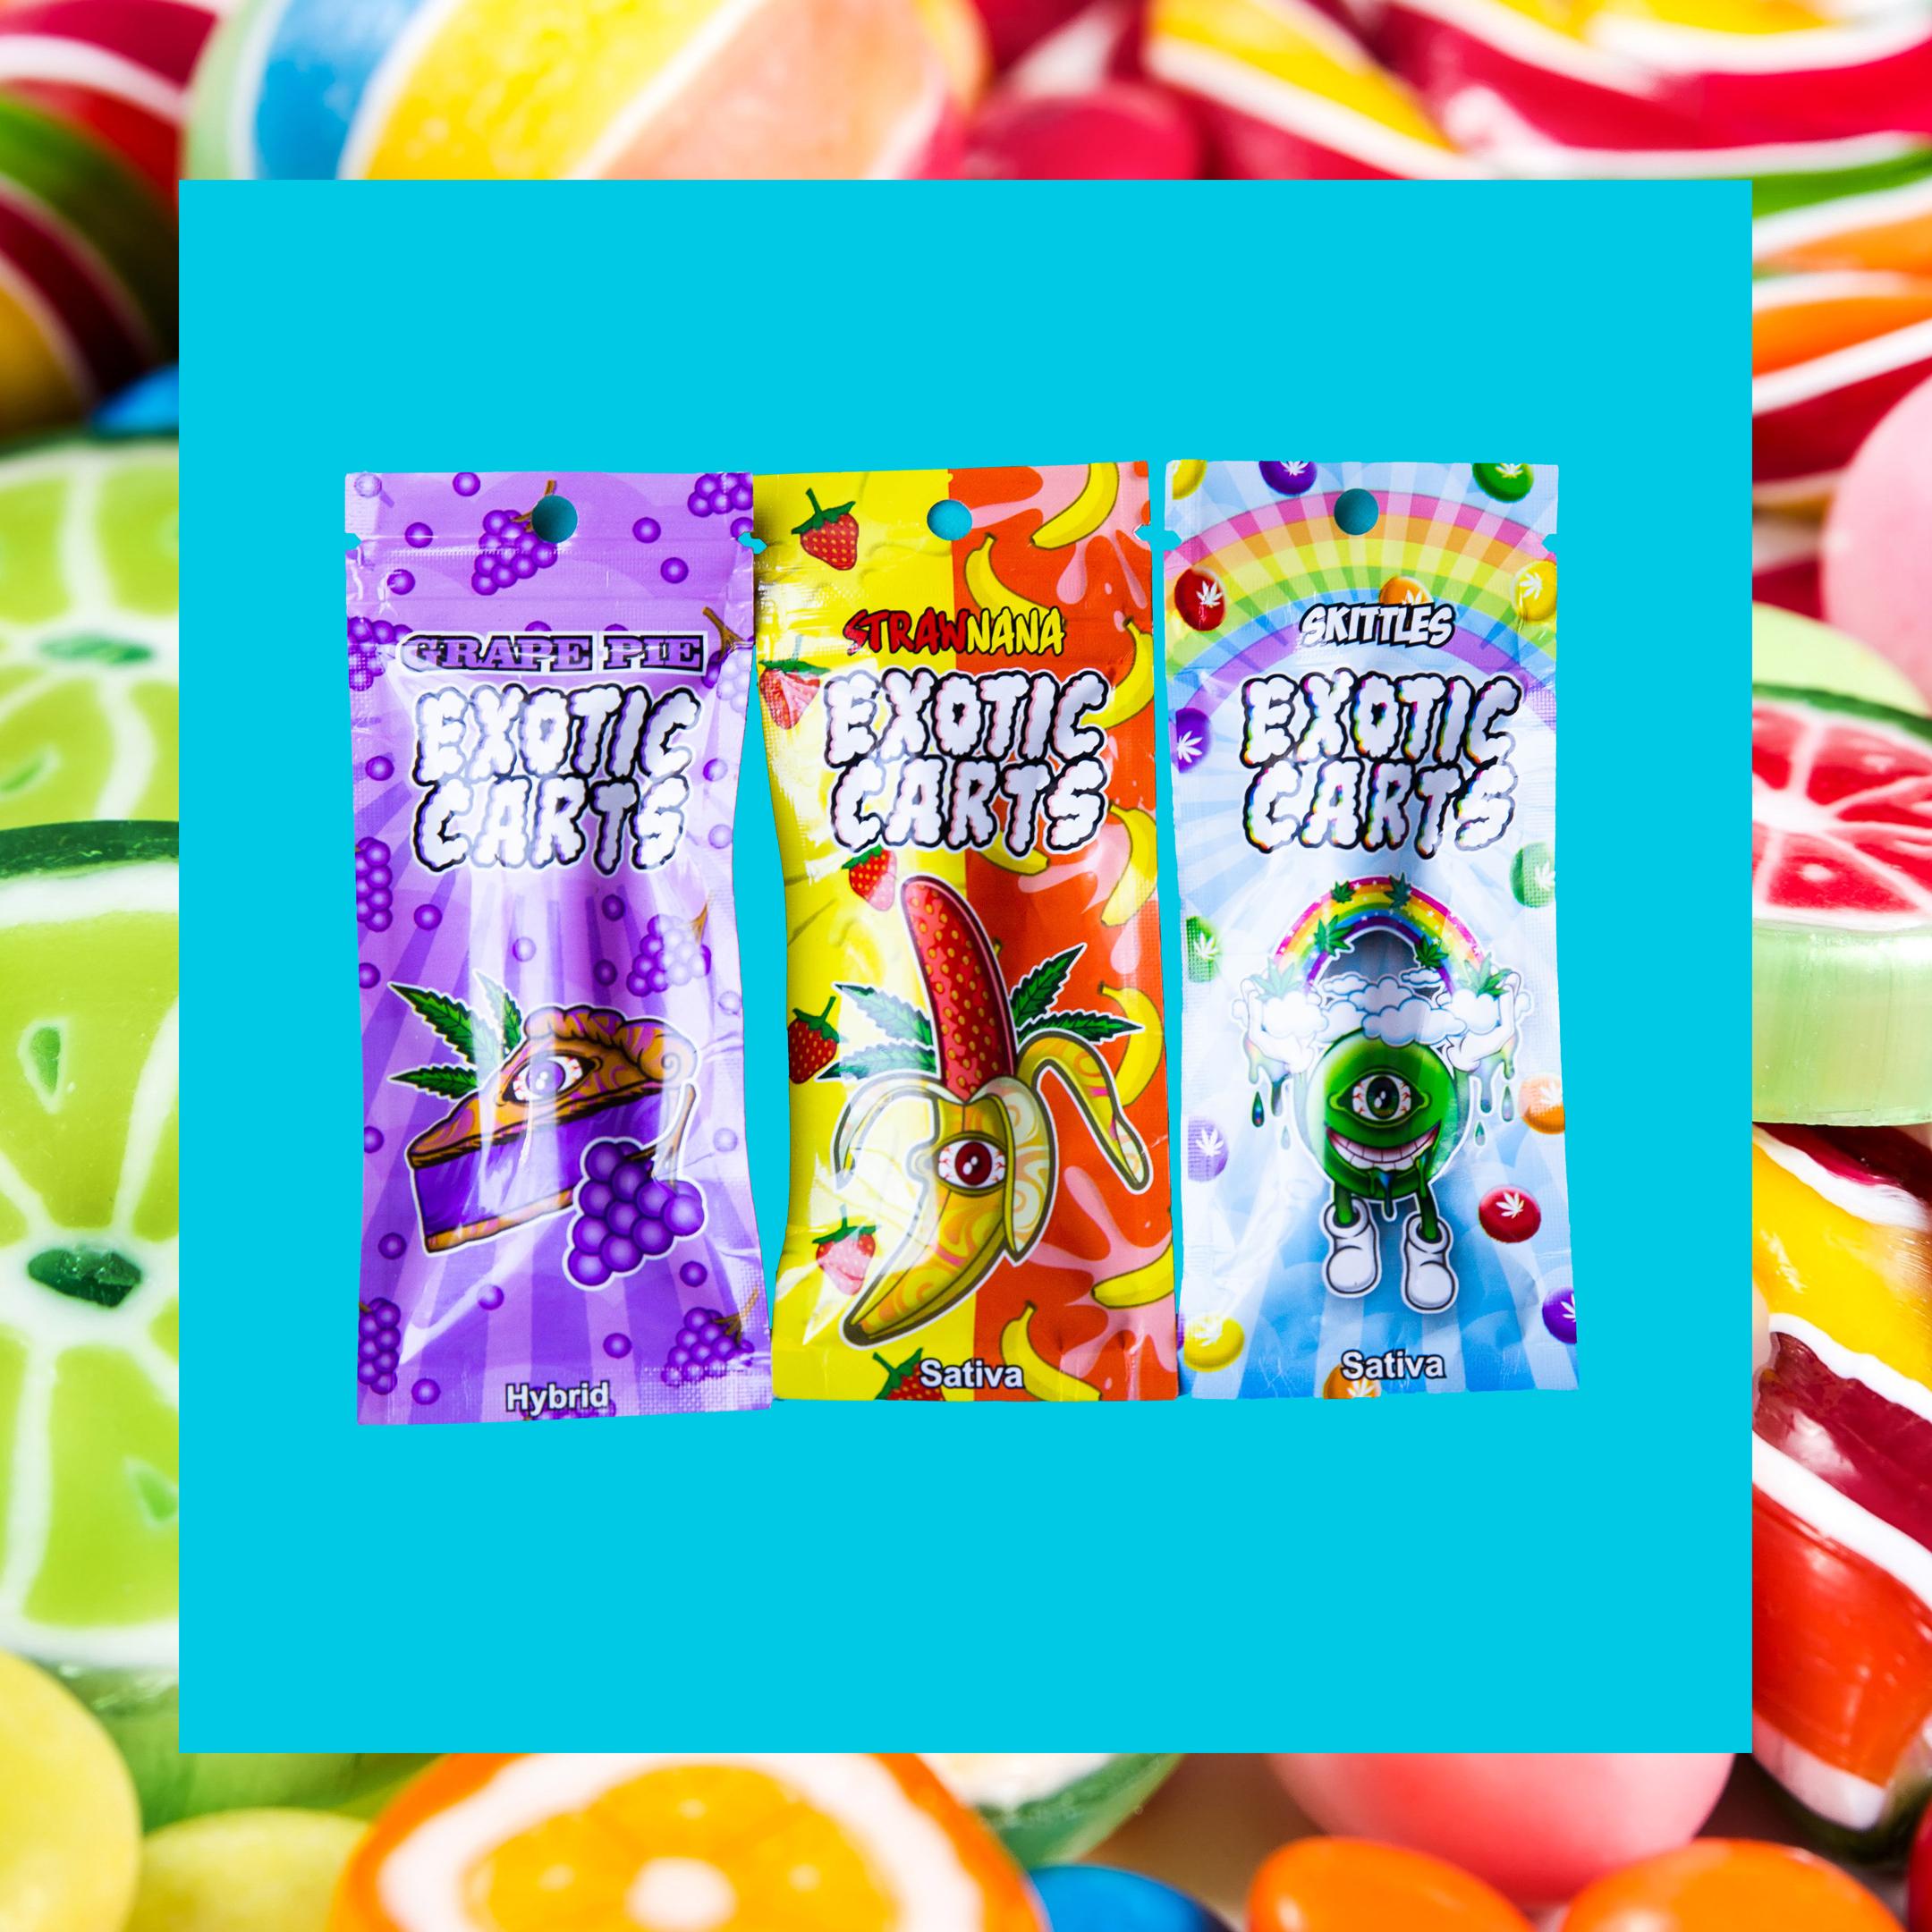 exoticcarts8.jpg